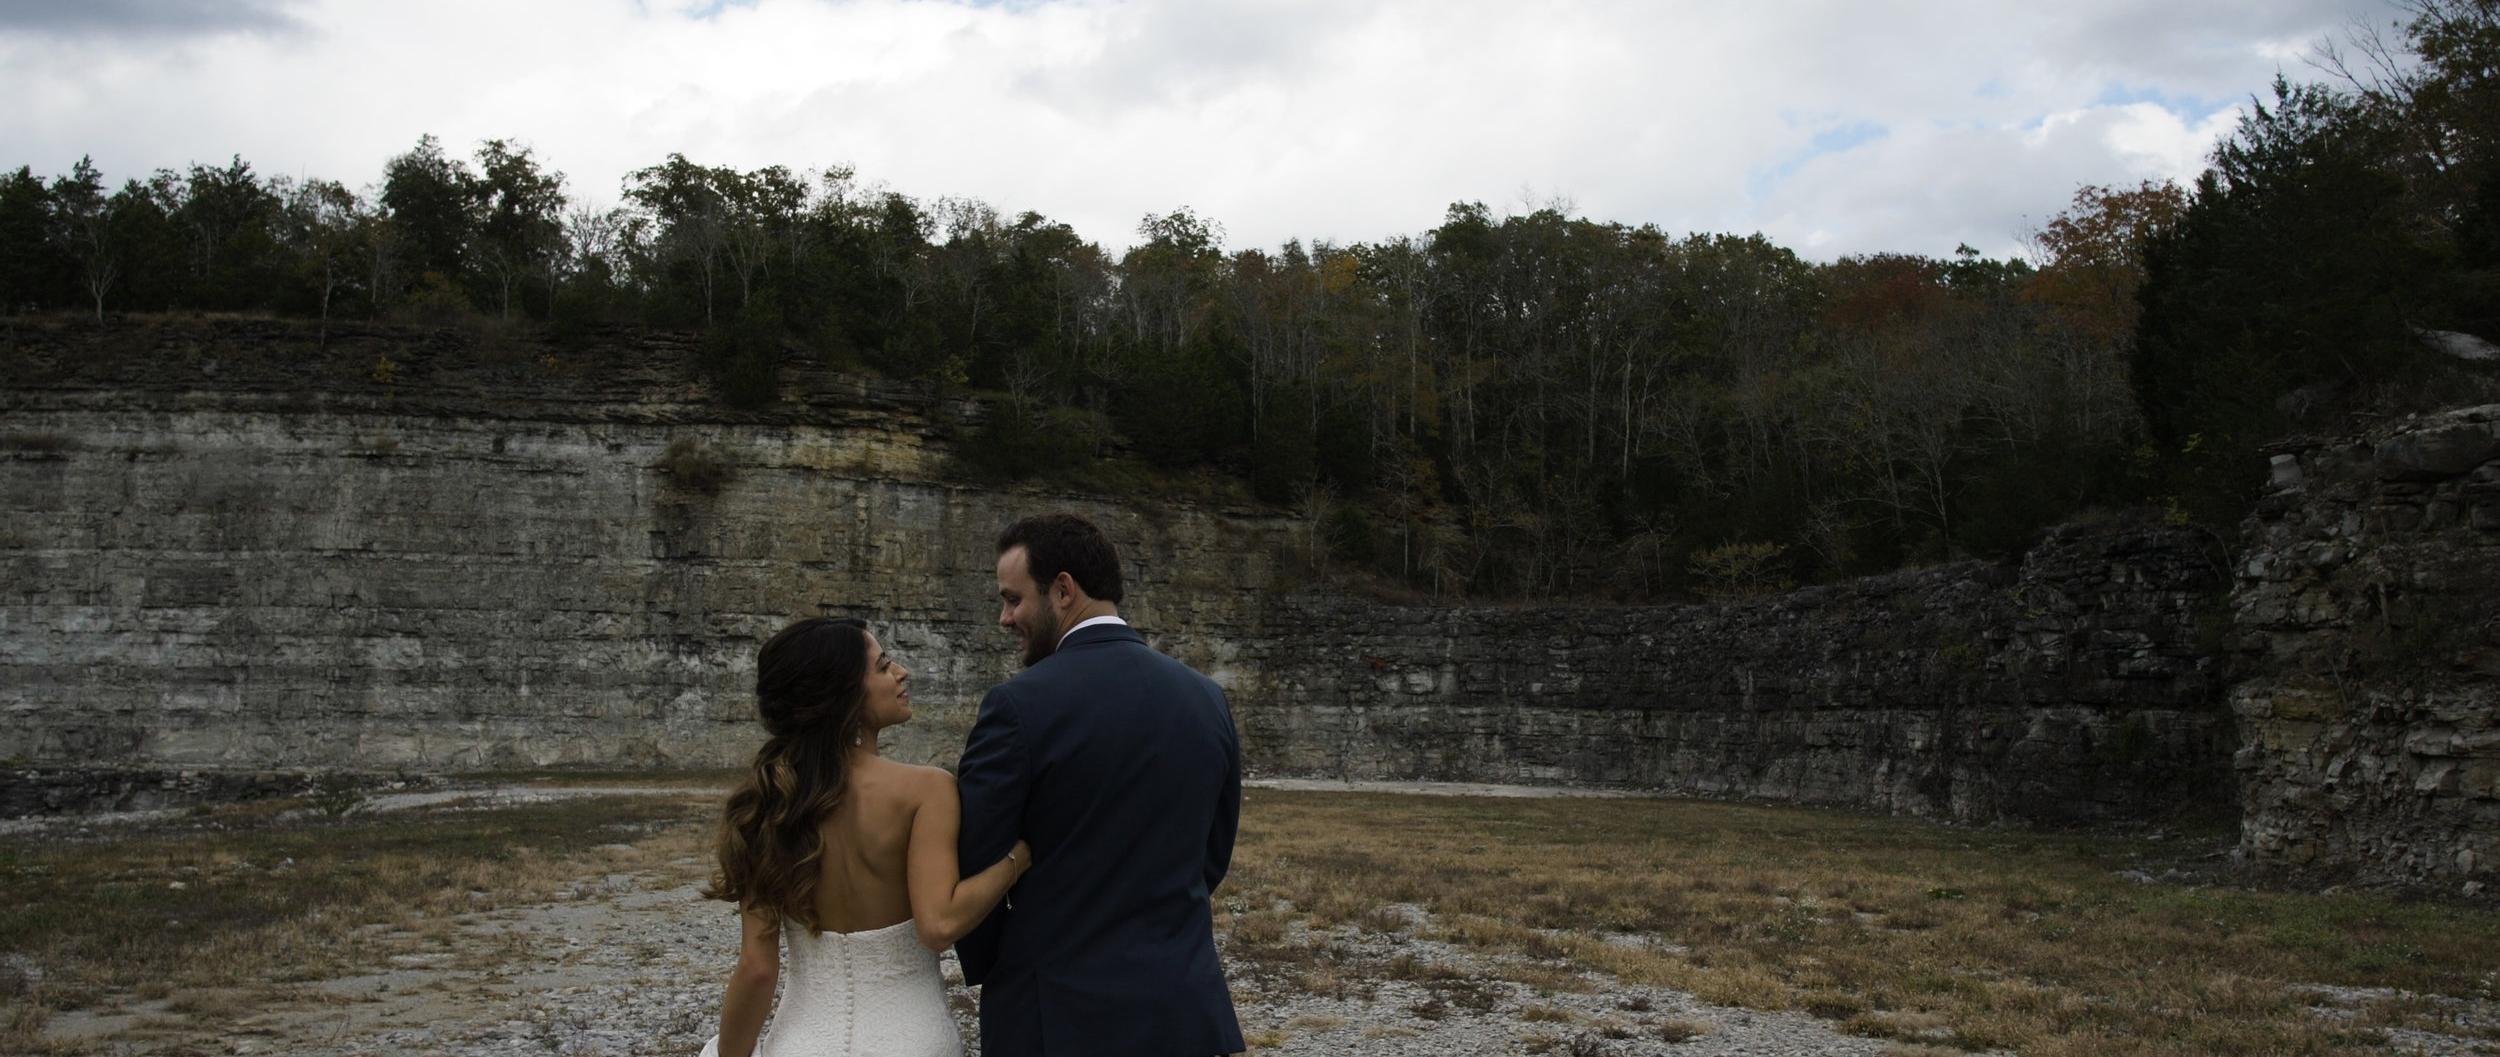 20171027 - Gabriella + Jason - Wedding - Short Film.00_04_43_17.Still001.jpg